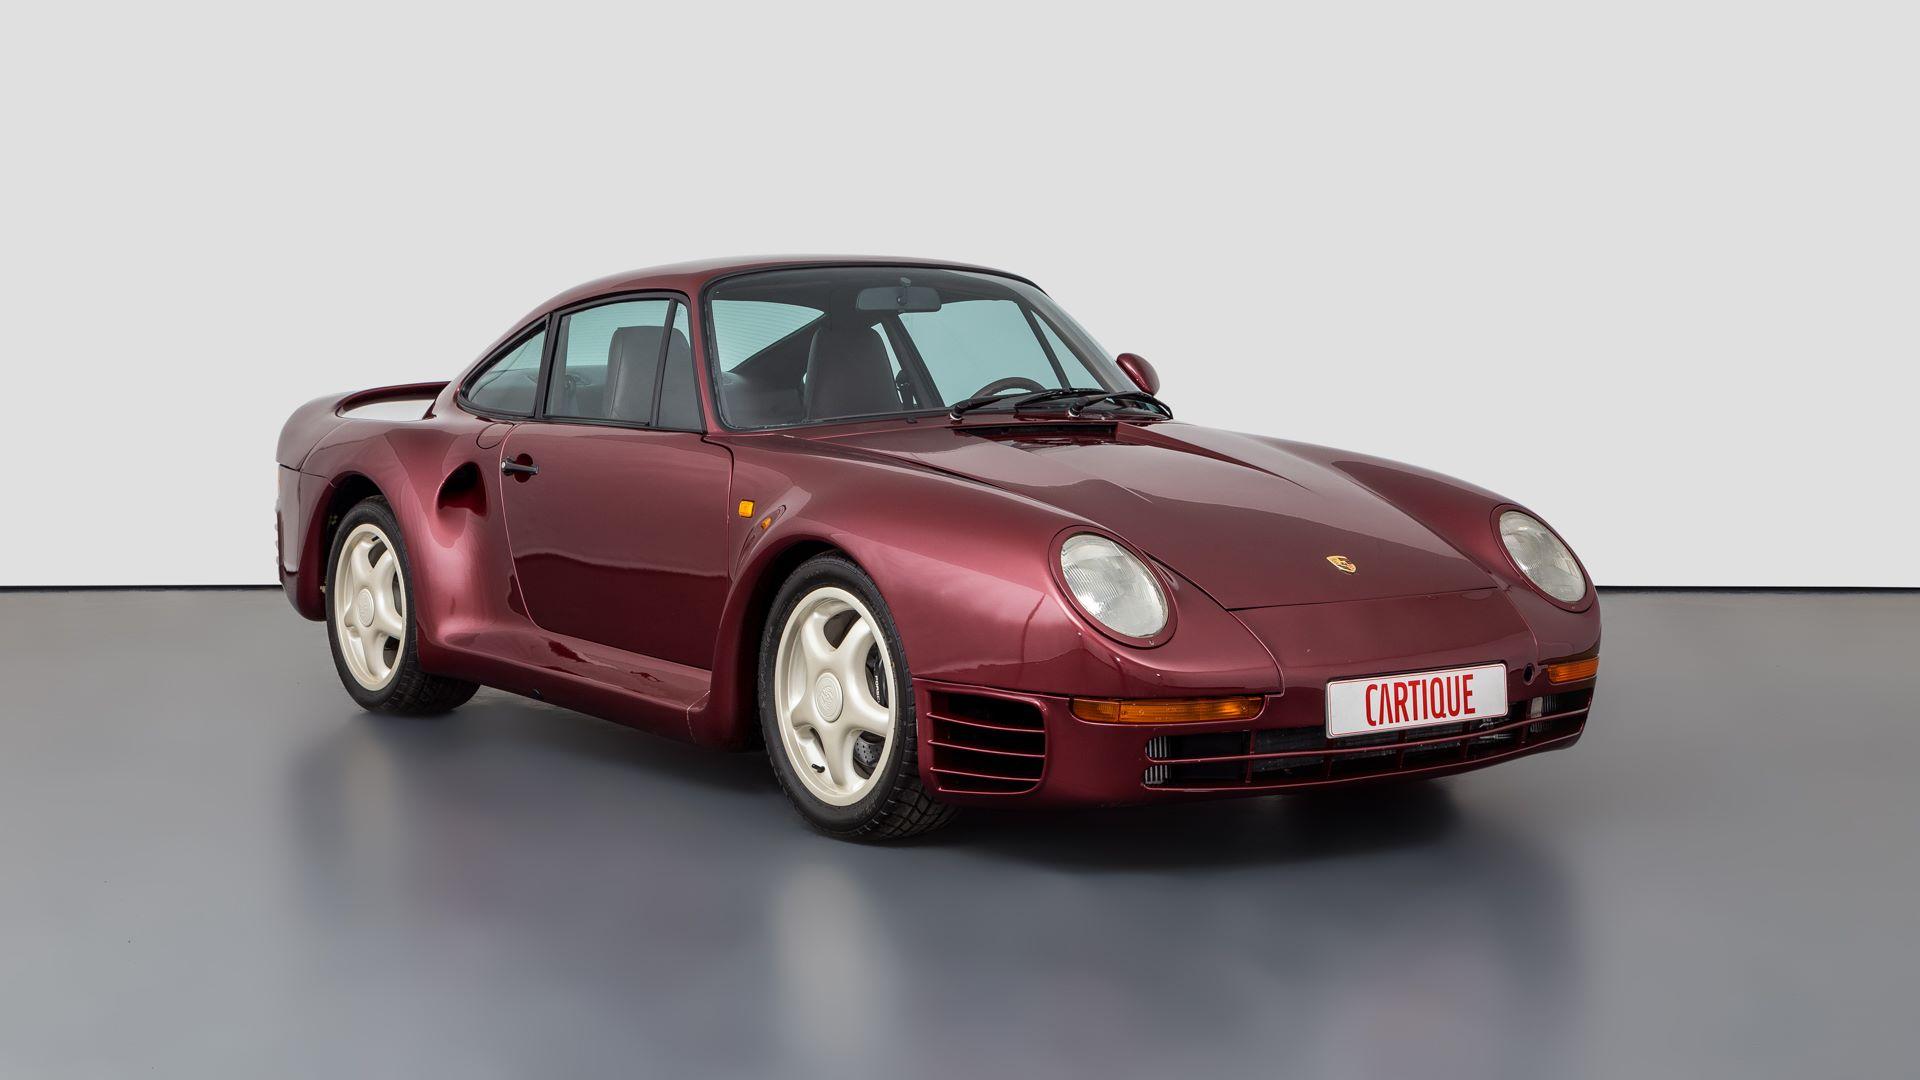 Porsche-959-Prototype-1985-for-sale-1